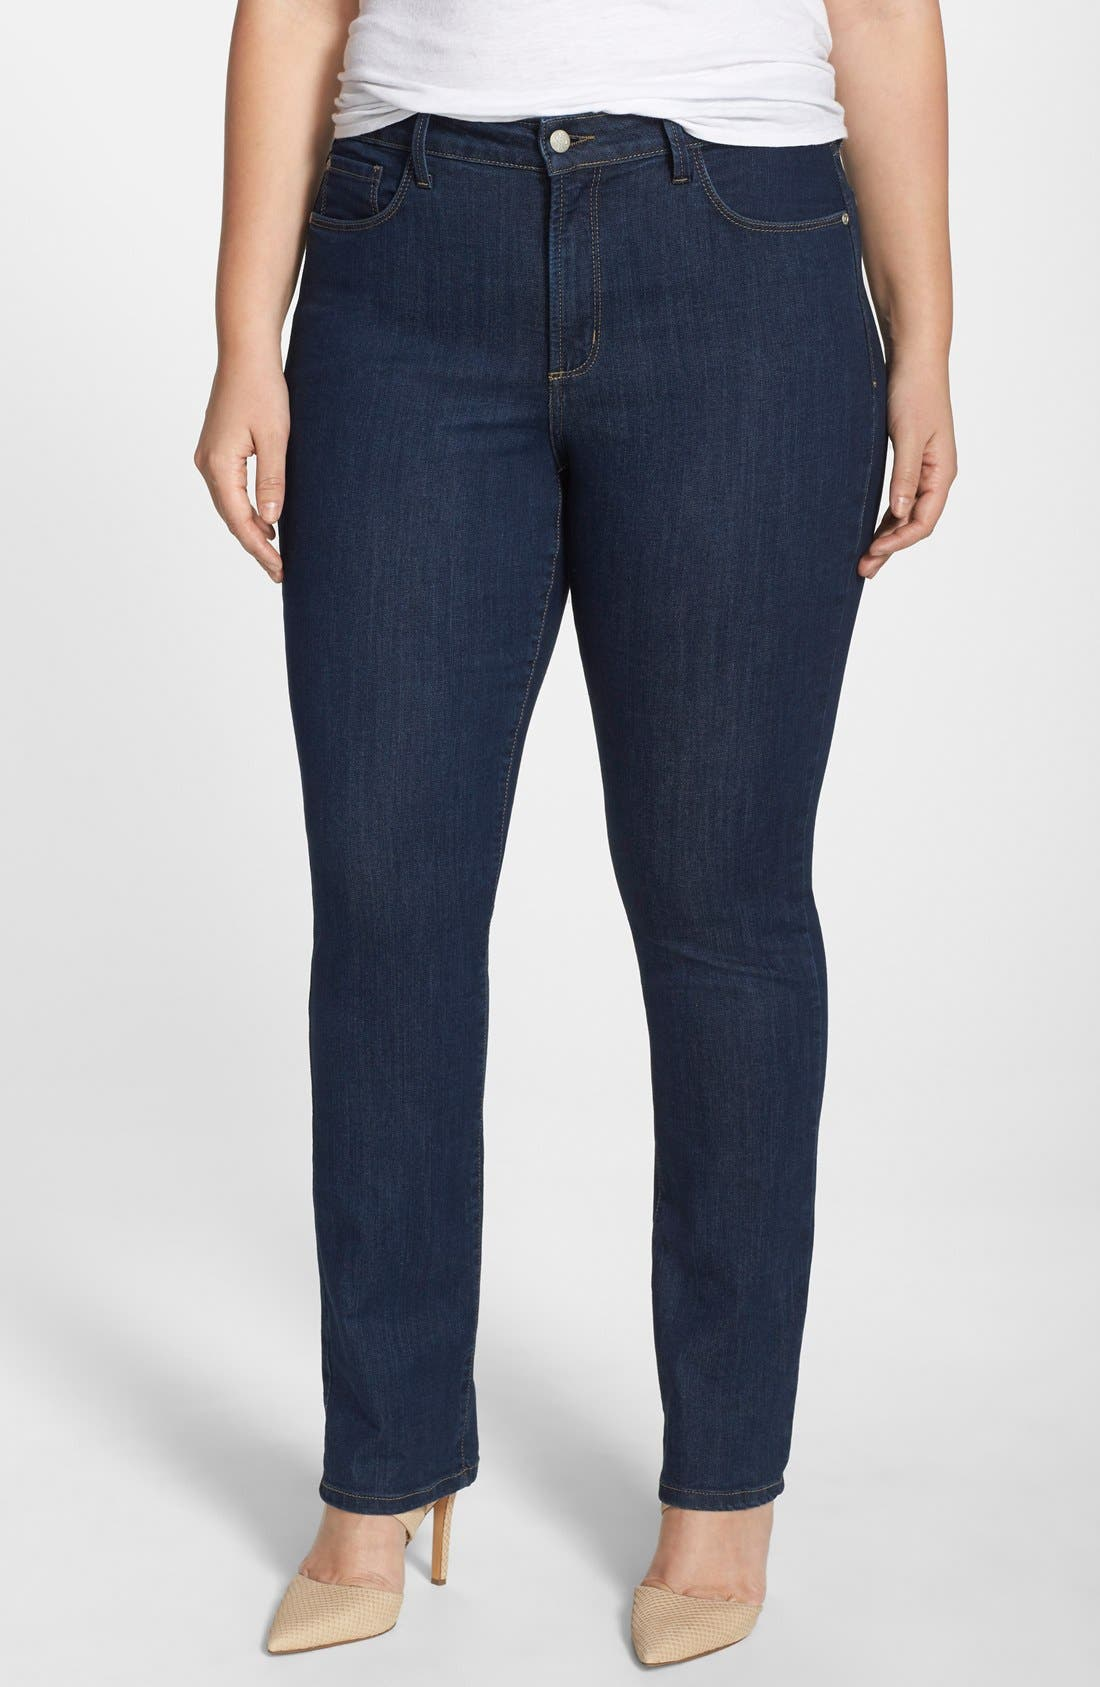 Alternate Image 1 Selected - NYDJ 'Samantha' Stretch Slim Straight Leg Jeans (Everett) (Plus Size)